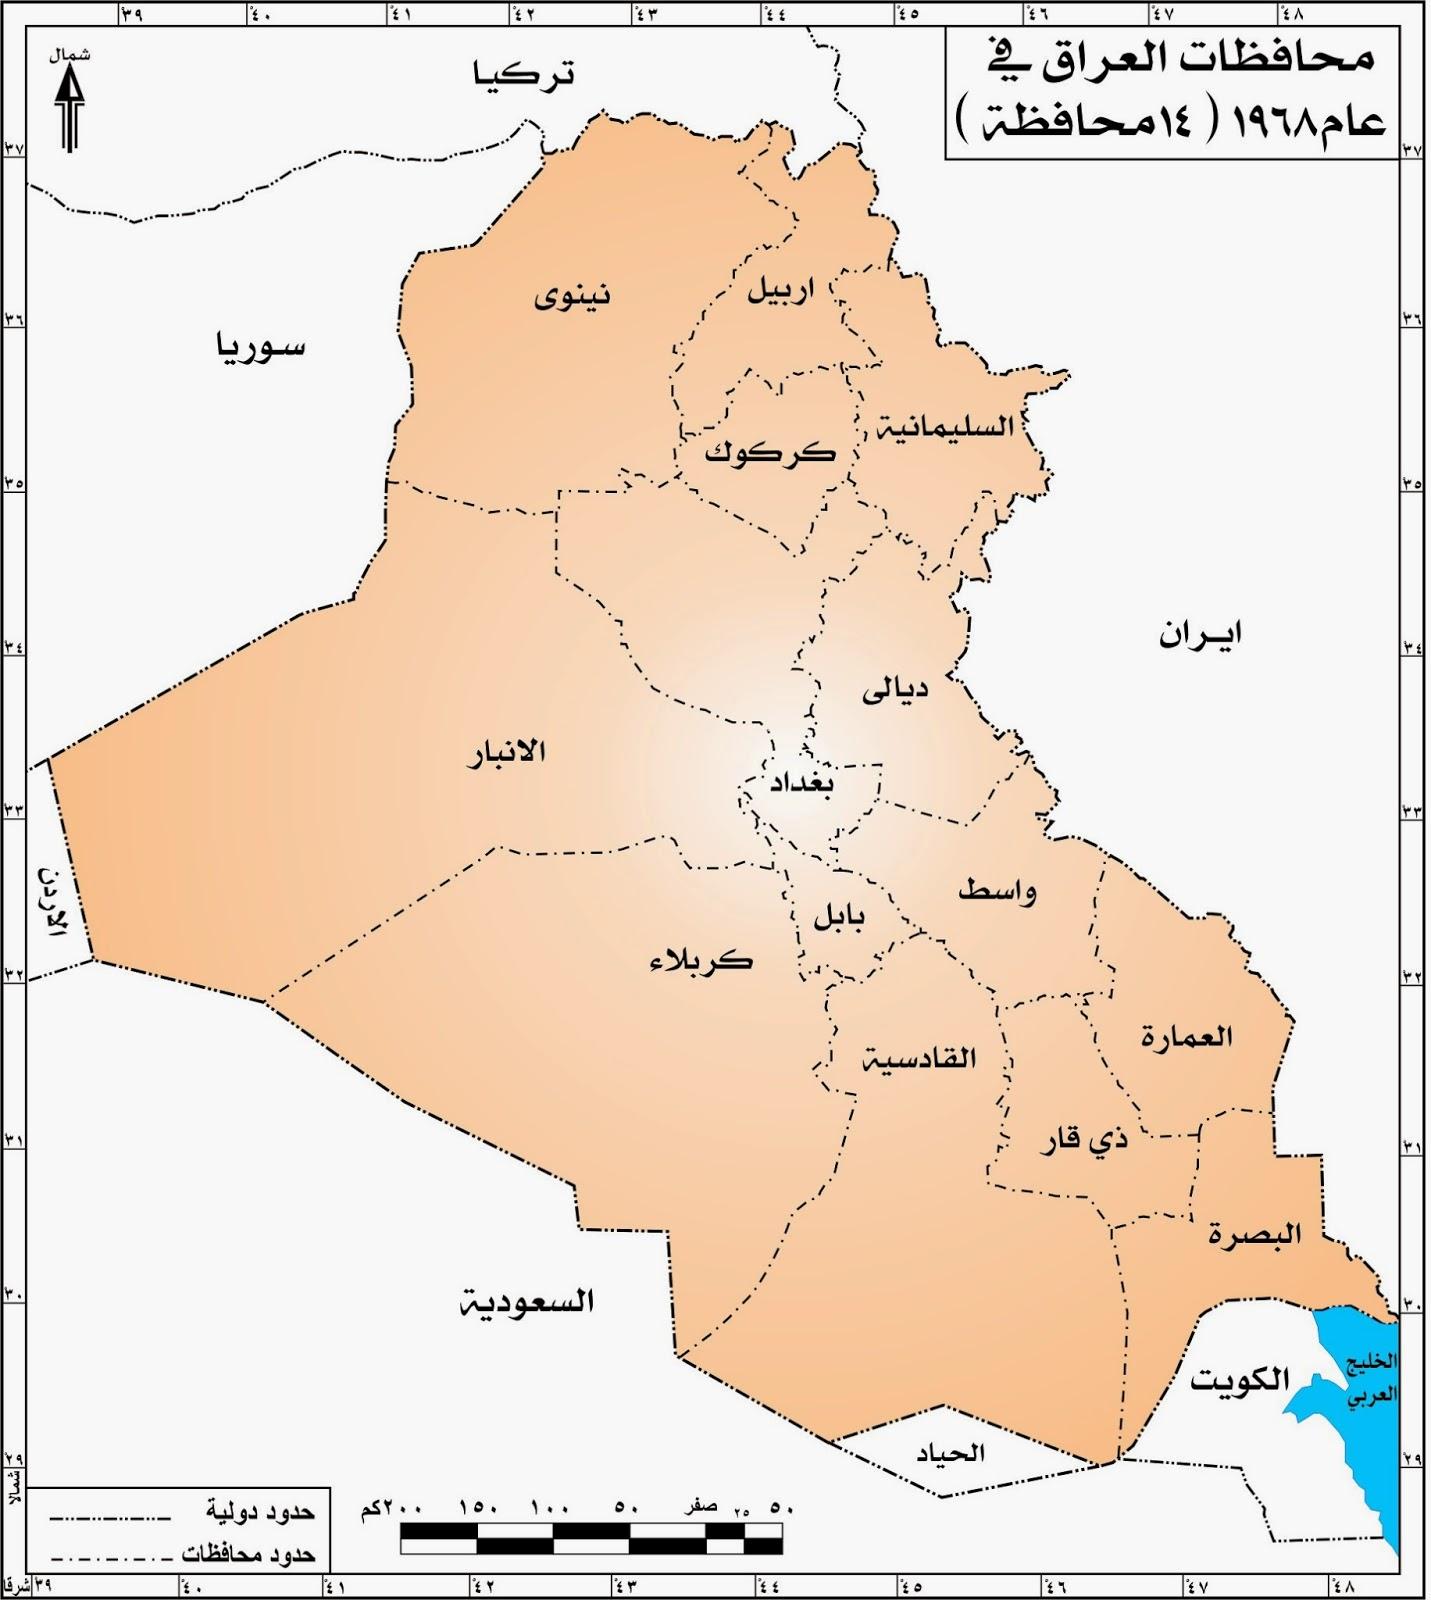 Hgmpd خارطة المحافظات في العراق عام1968